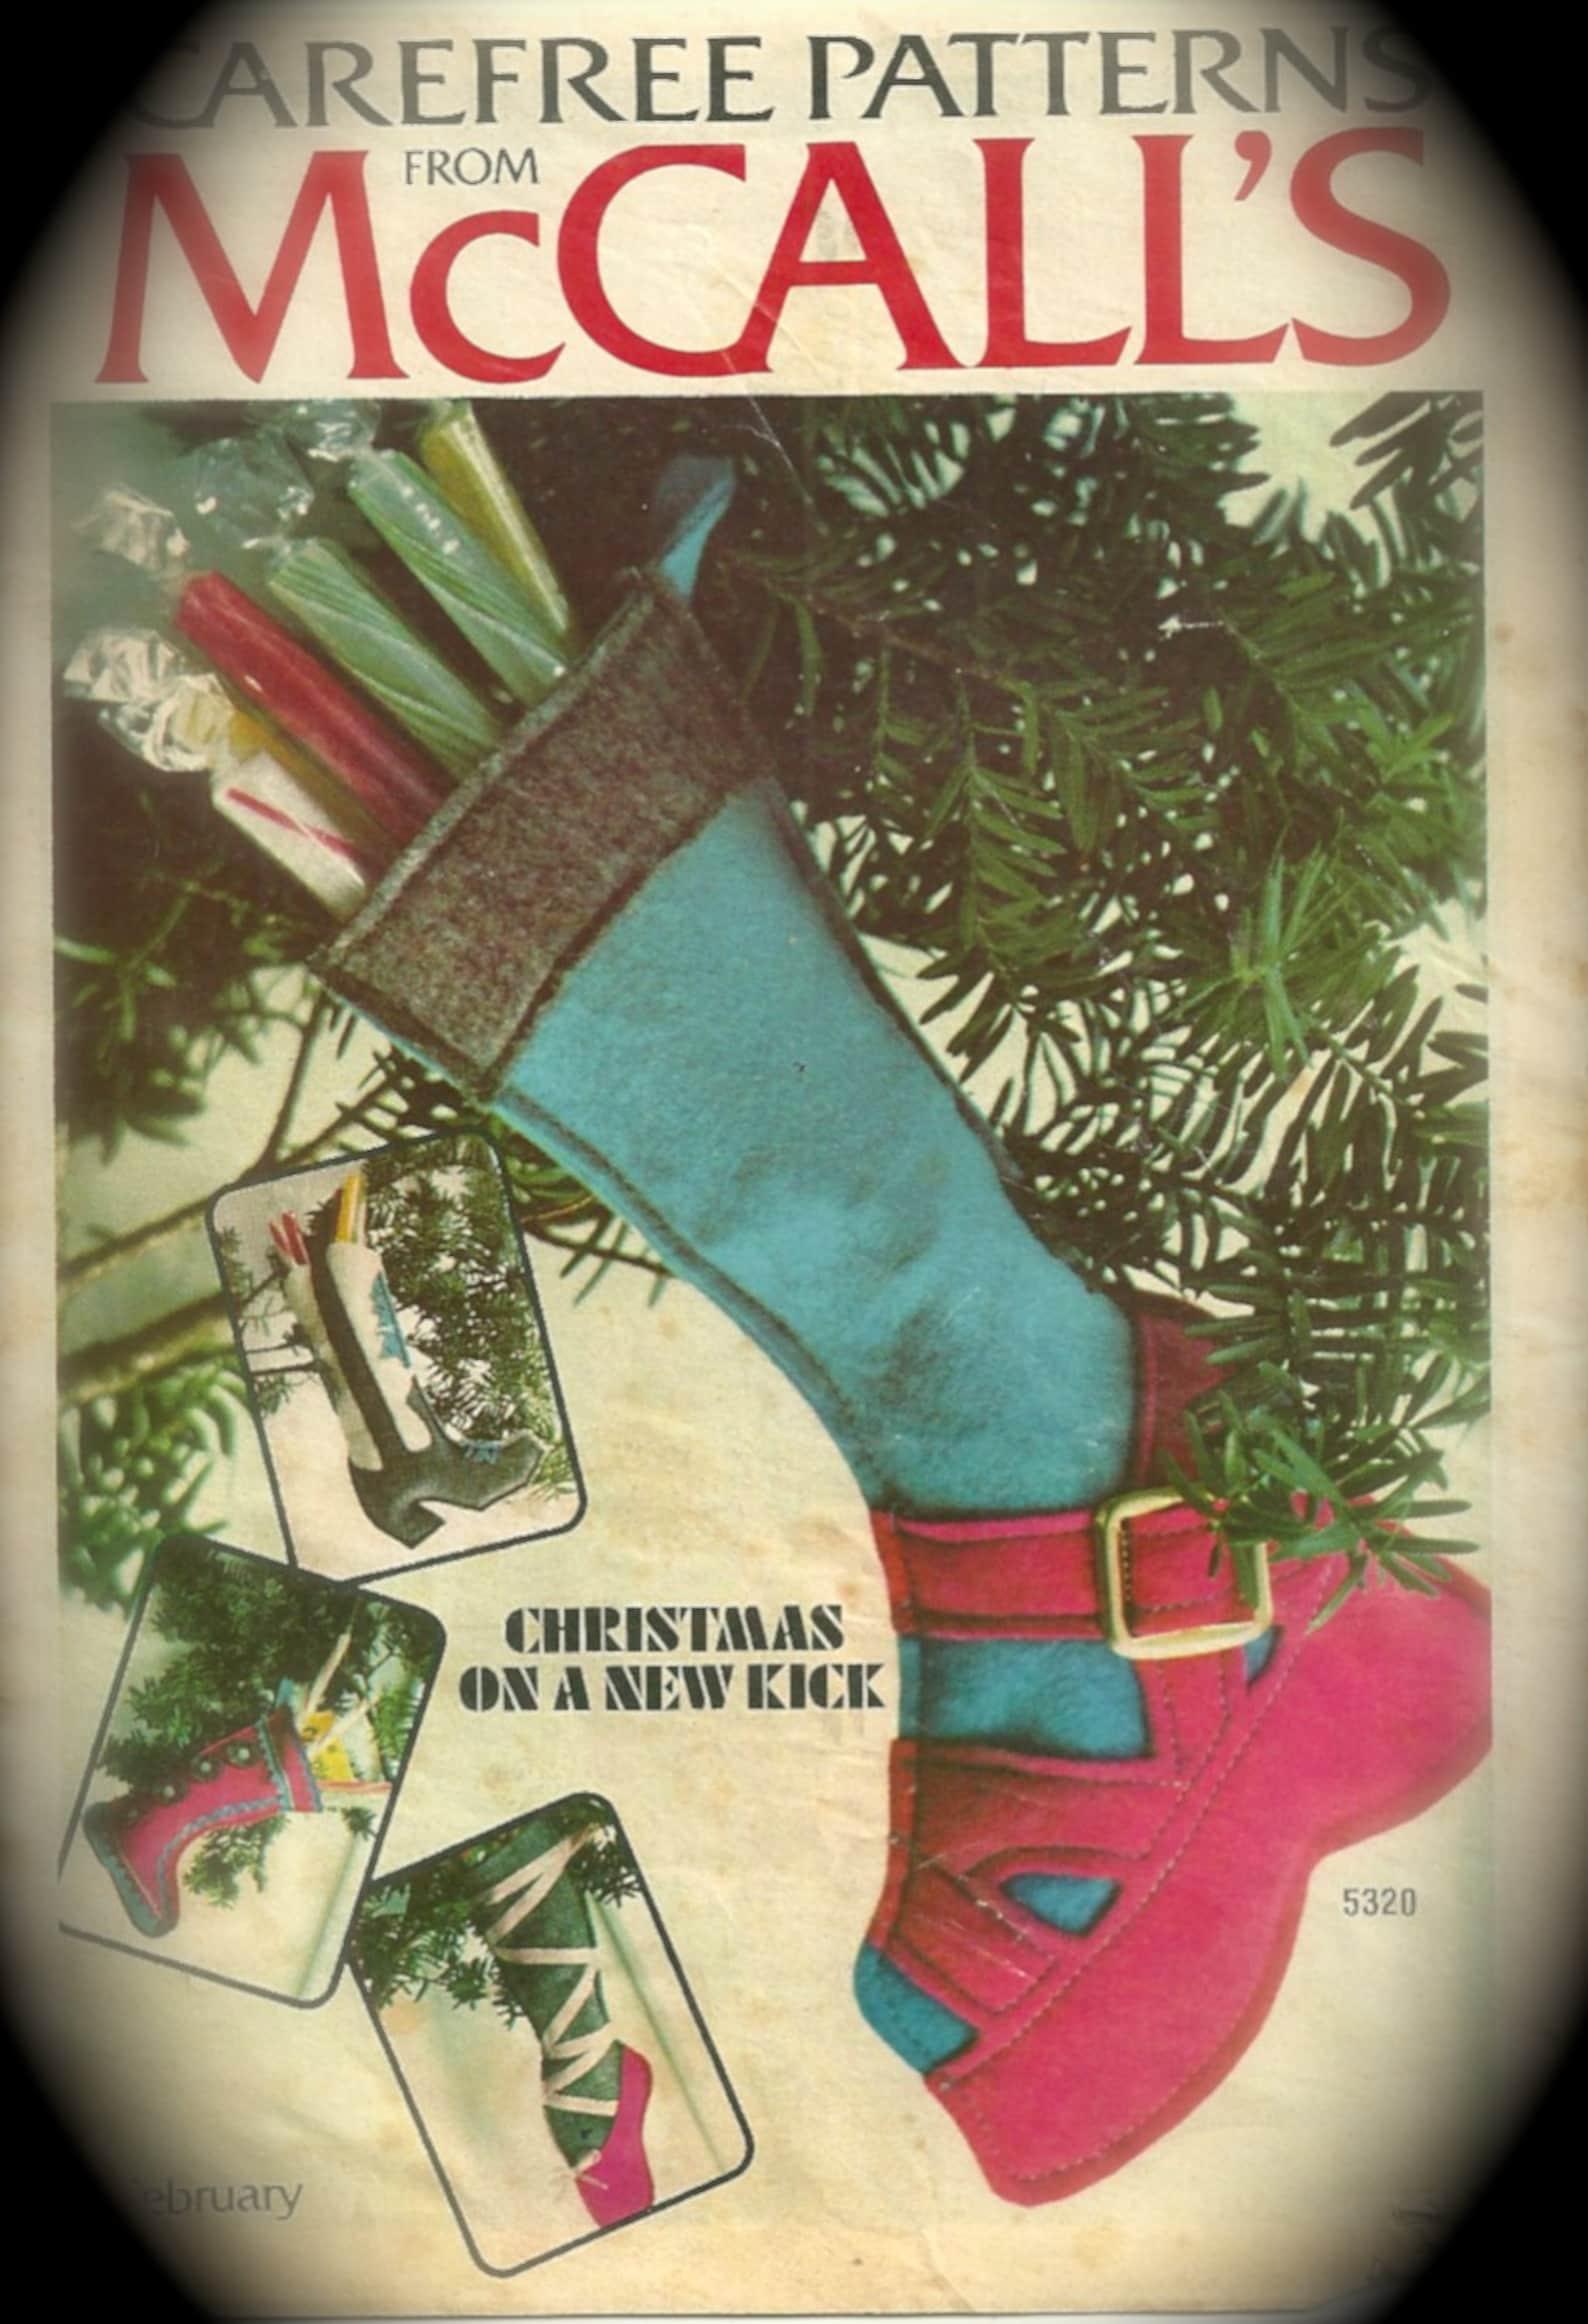 mccalls 5320 christmas stockings pattern ballet slipper skater runner mukluk cowboy boot fireman vintage funky shoe sewing patte